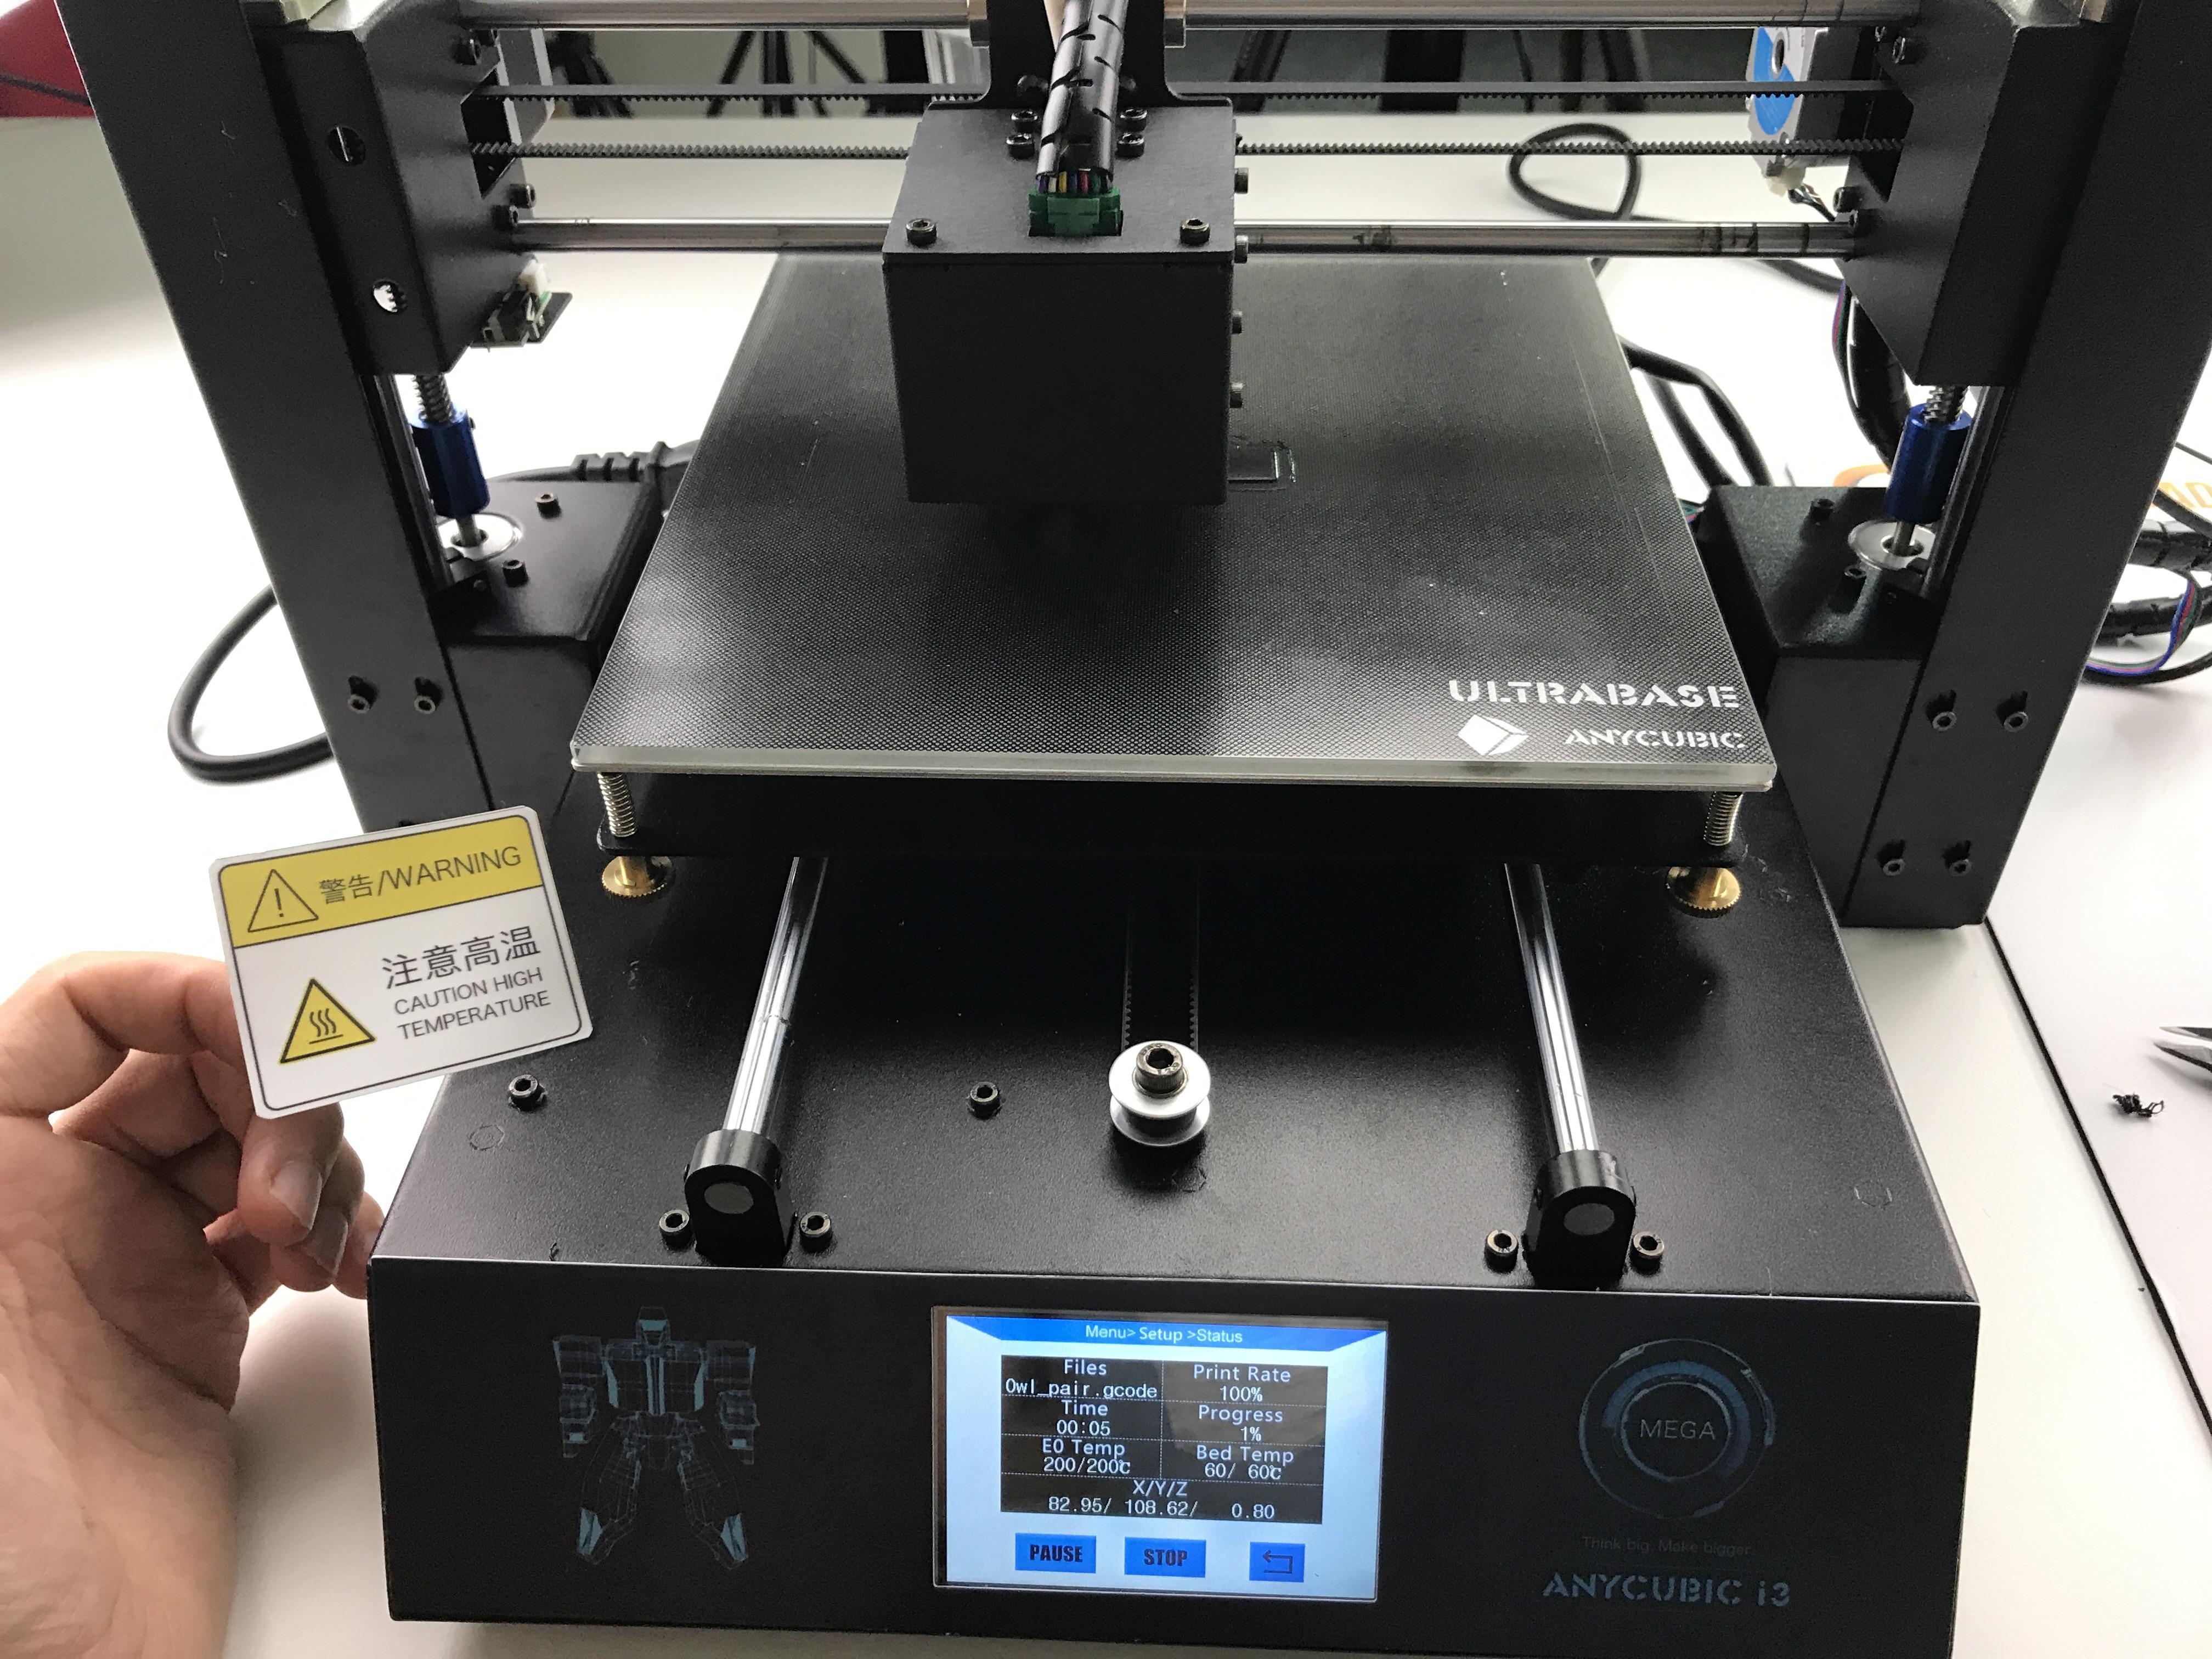 Anycubic I3 MEGA 3D Printer (Full Metal Frame, 2x Z-Axis